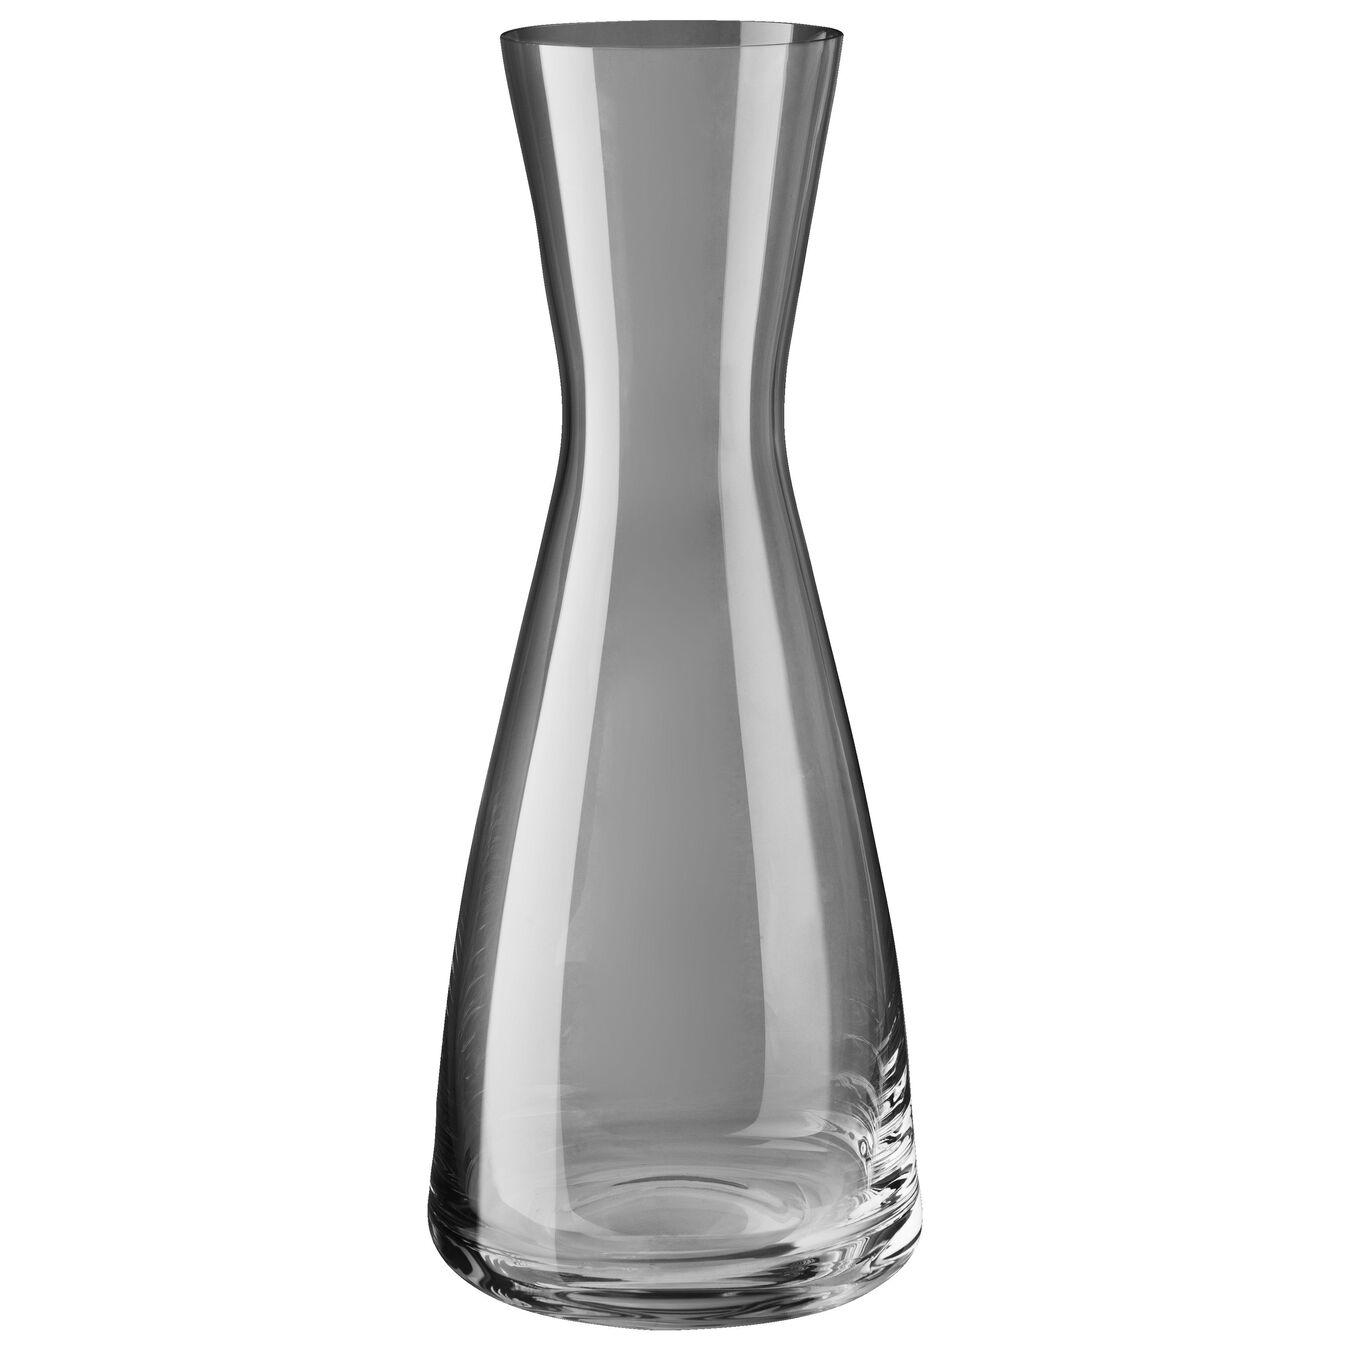 Carafe, Verre cristallin,,large 2